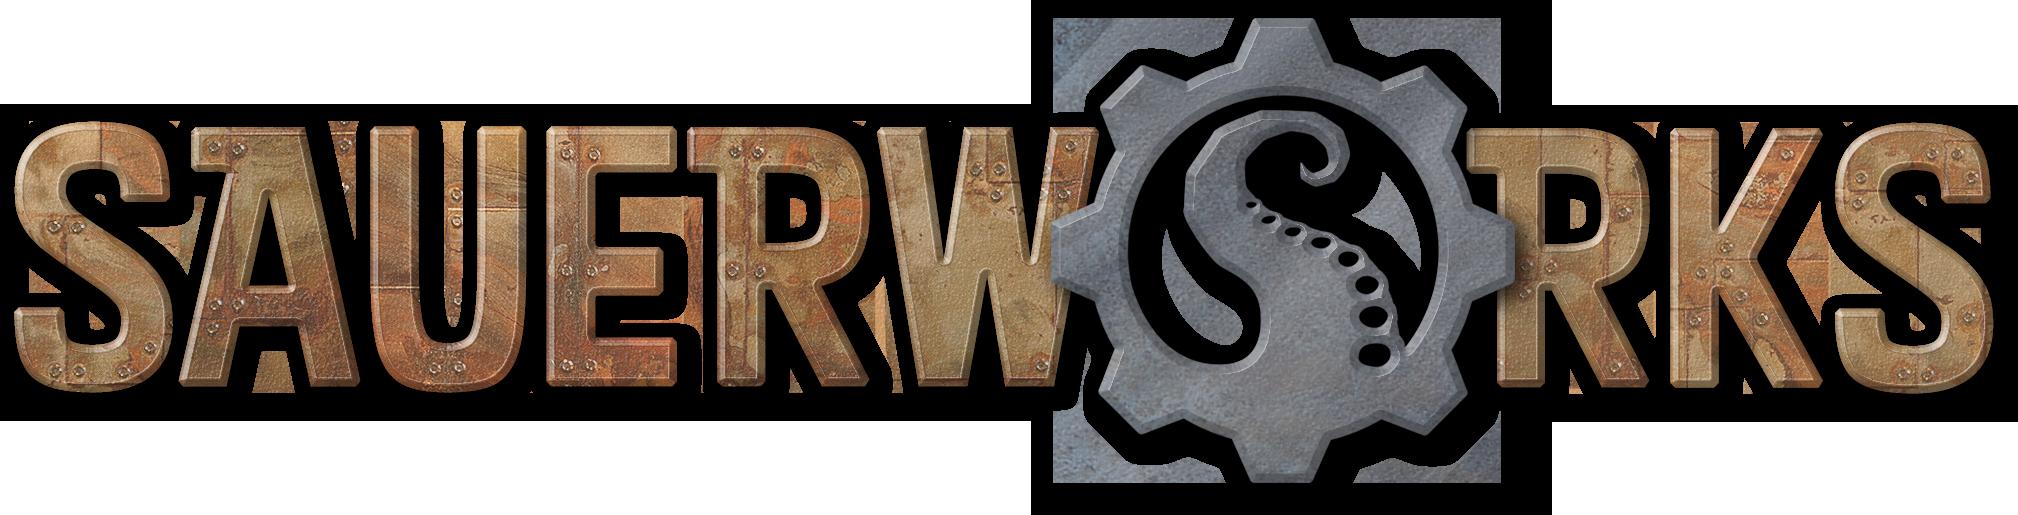 sauerworks-textured-one-line-logo.png